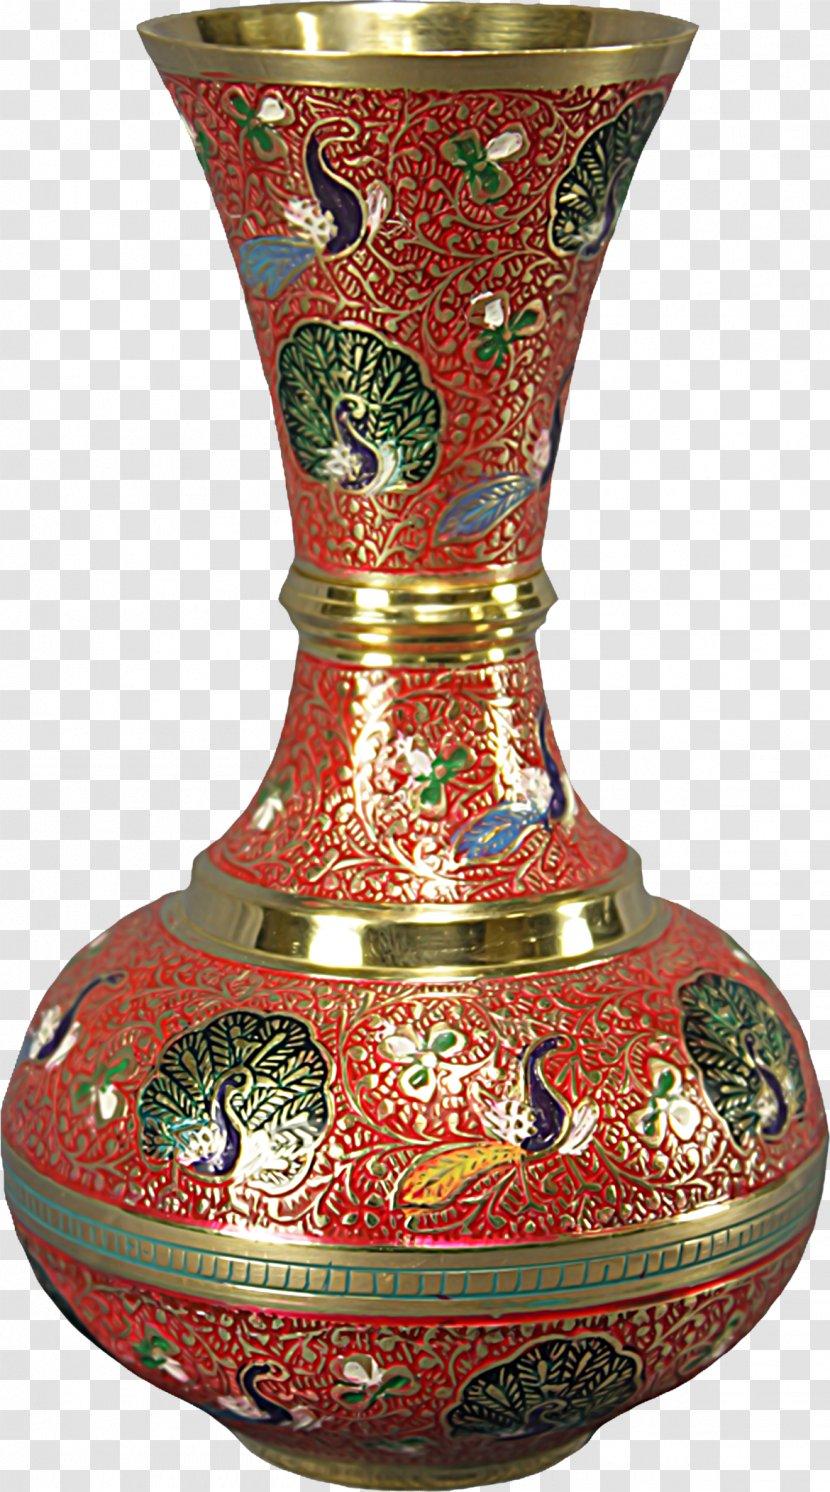 Vase Of Flowers Ceramic - Dubai Bottle Material Free To Pull Transparent PNG